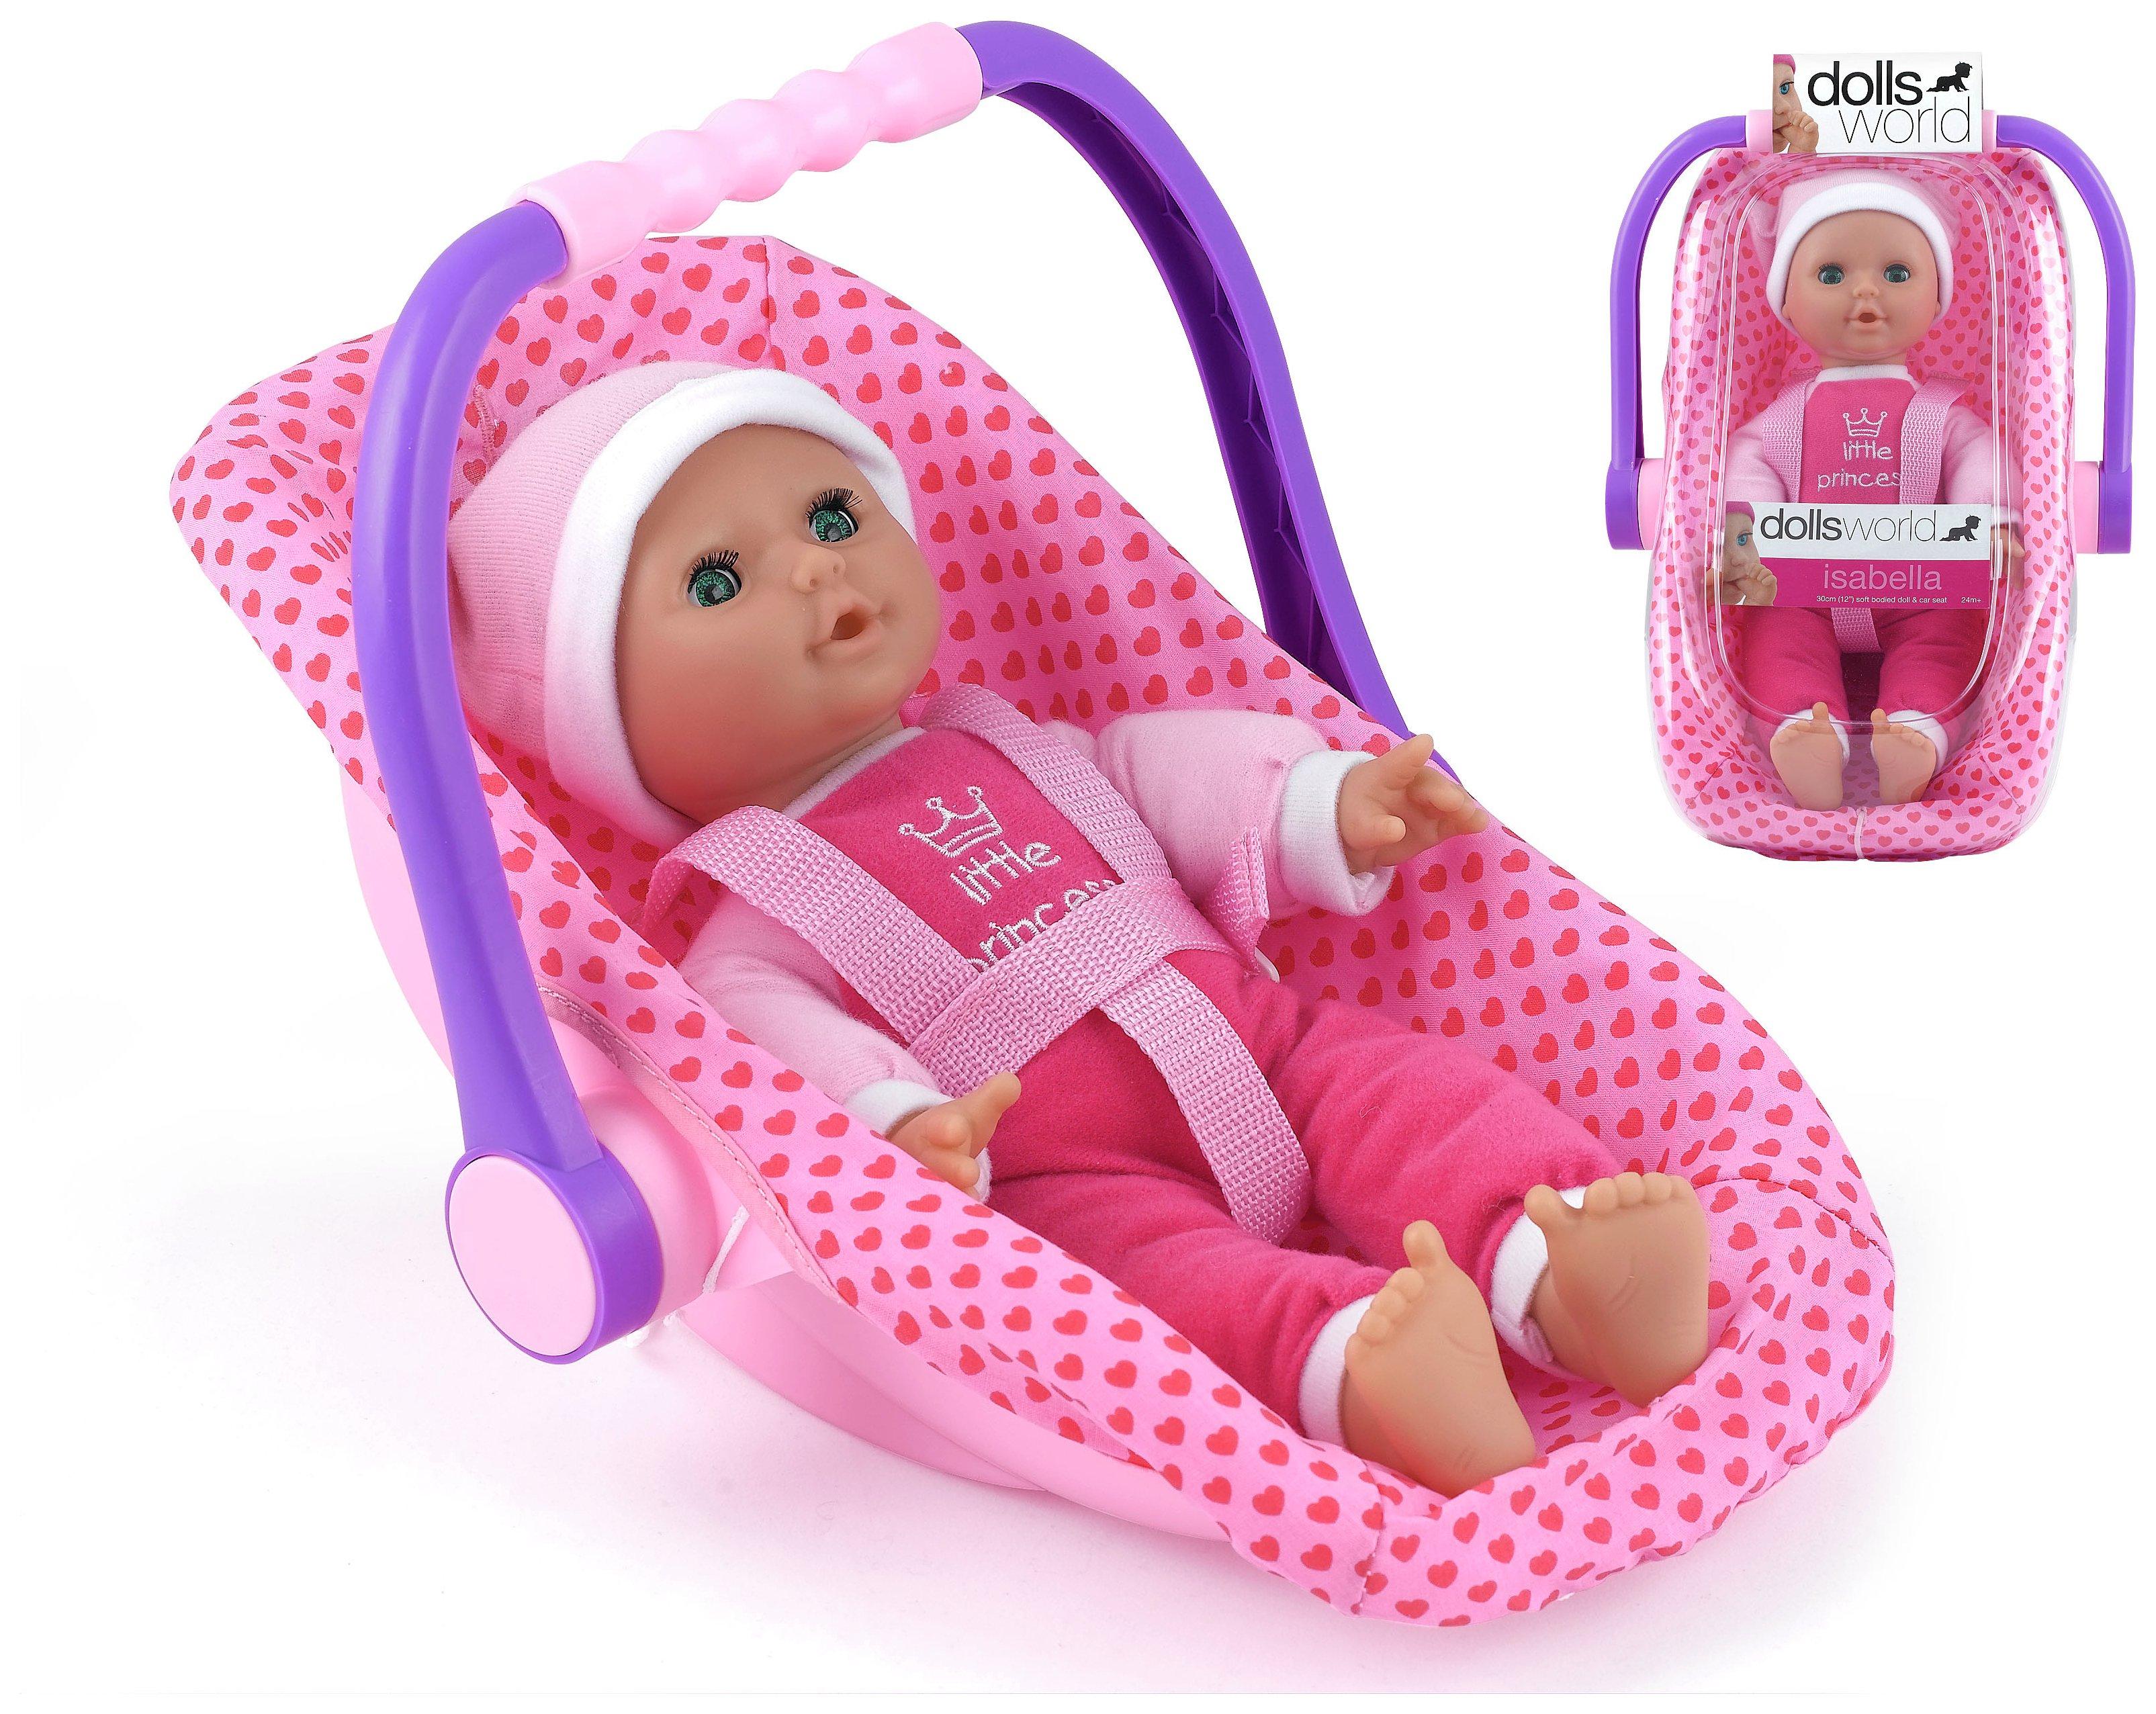 Image of Dollsworld Isabella Doll Rock Car Seat.